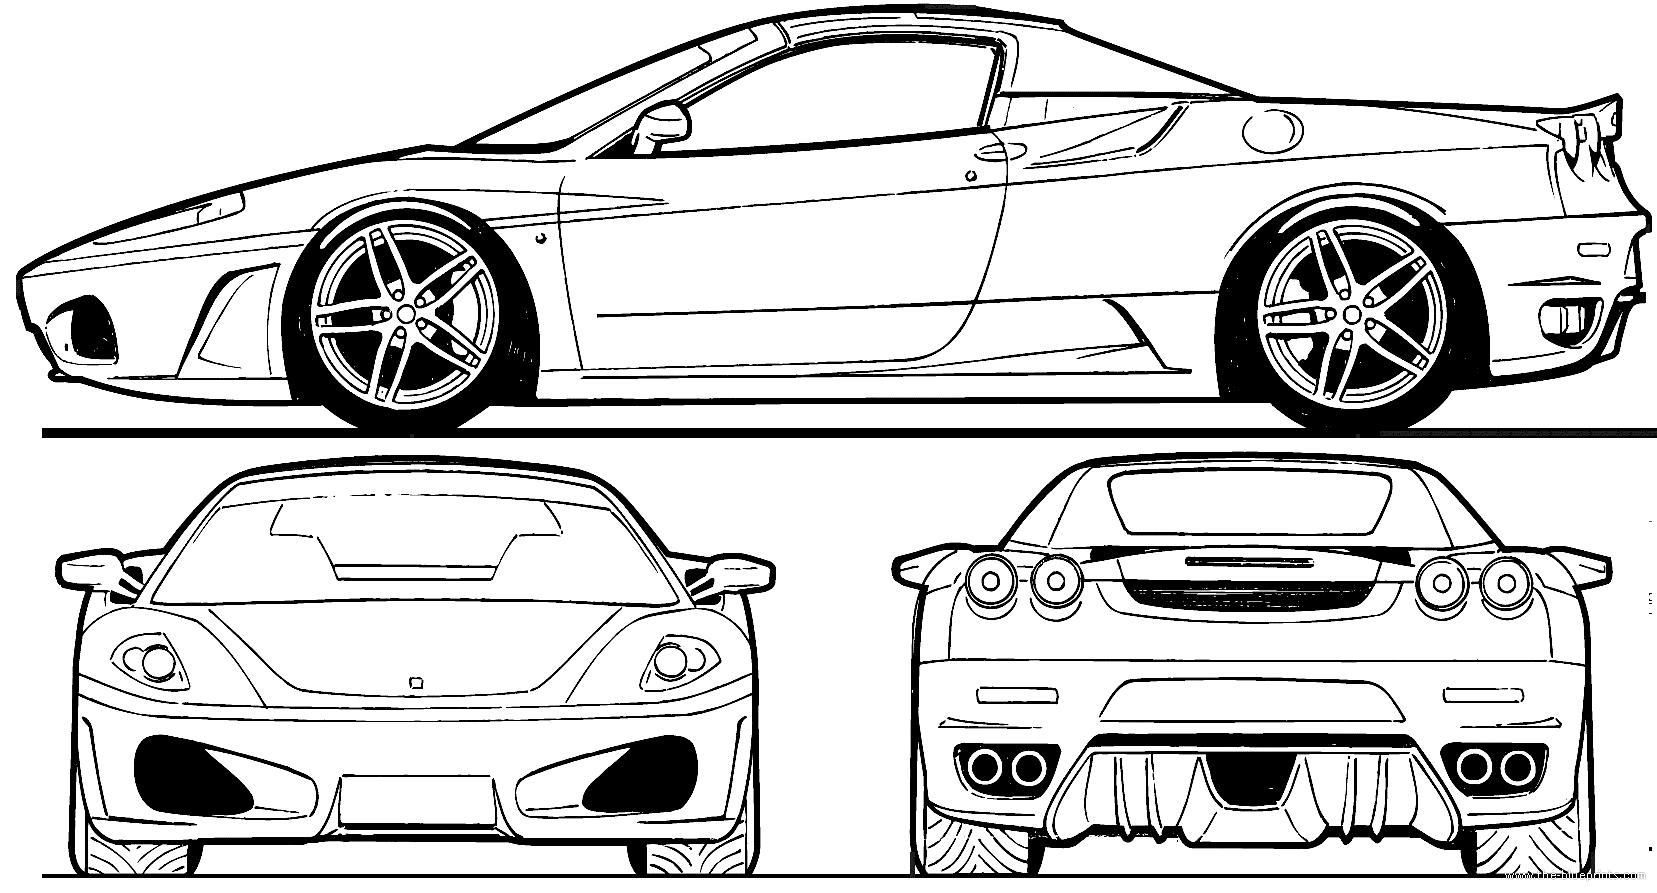 Ferrari ferrari dimensions car and auto pictures all types all ferrari ferrari dimensions the blueprints blueprints cars ferrari malvernweather Choice Image